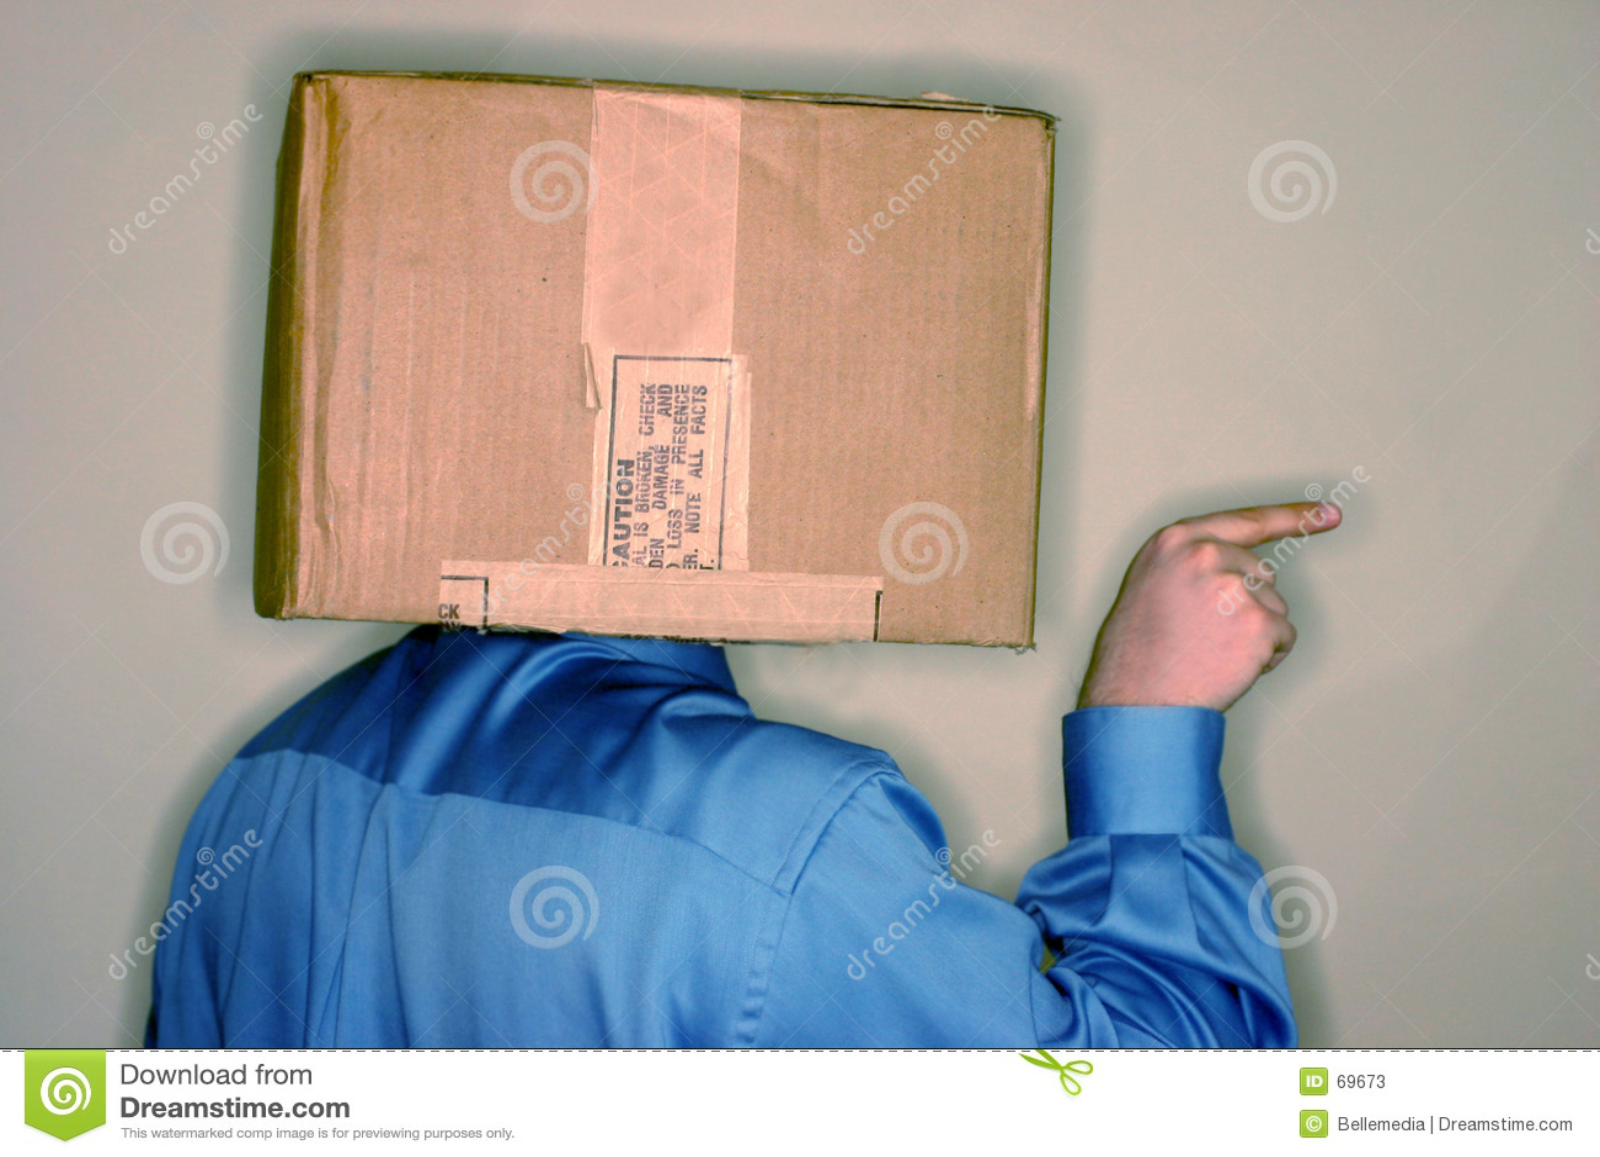 Think Outside The Box 2 Stock Image Image Of Employee